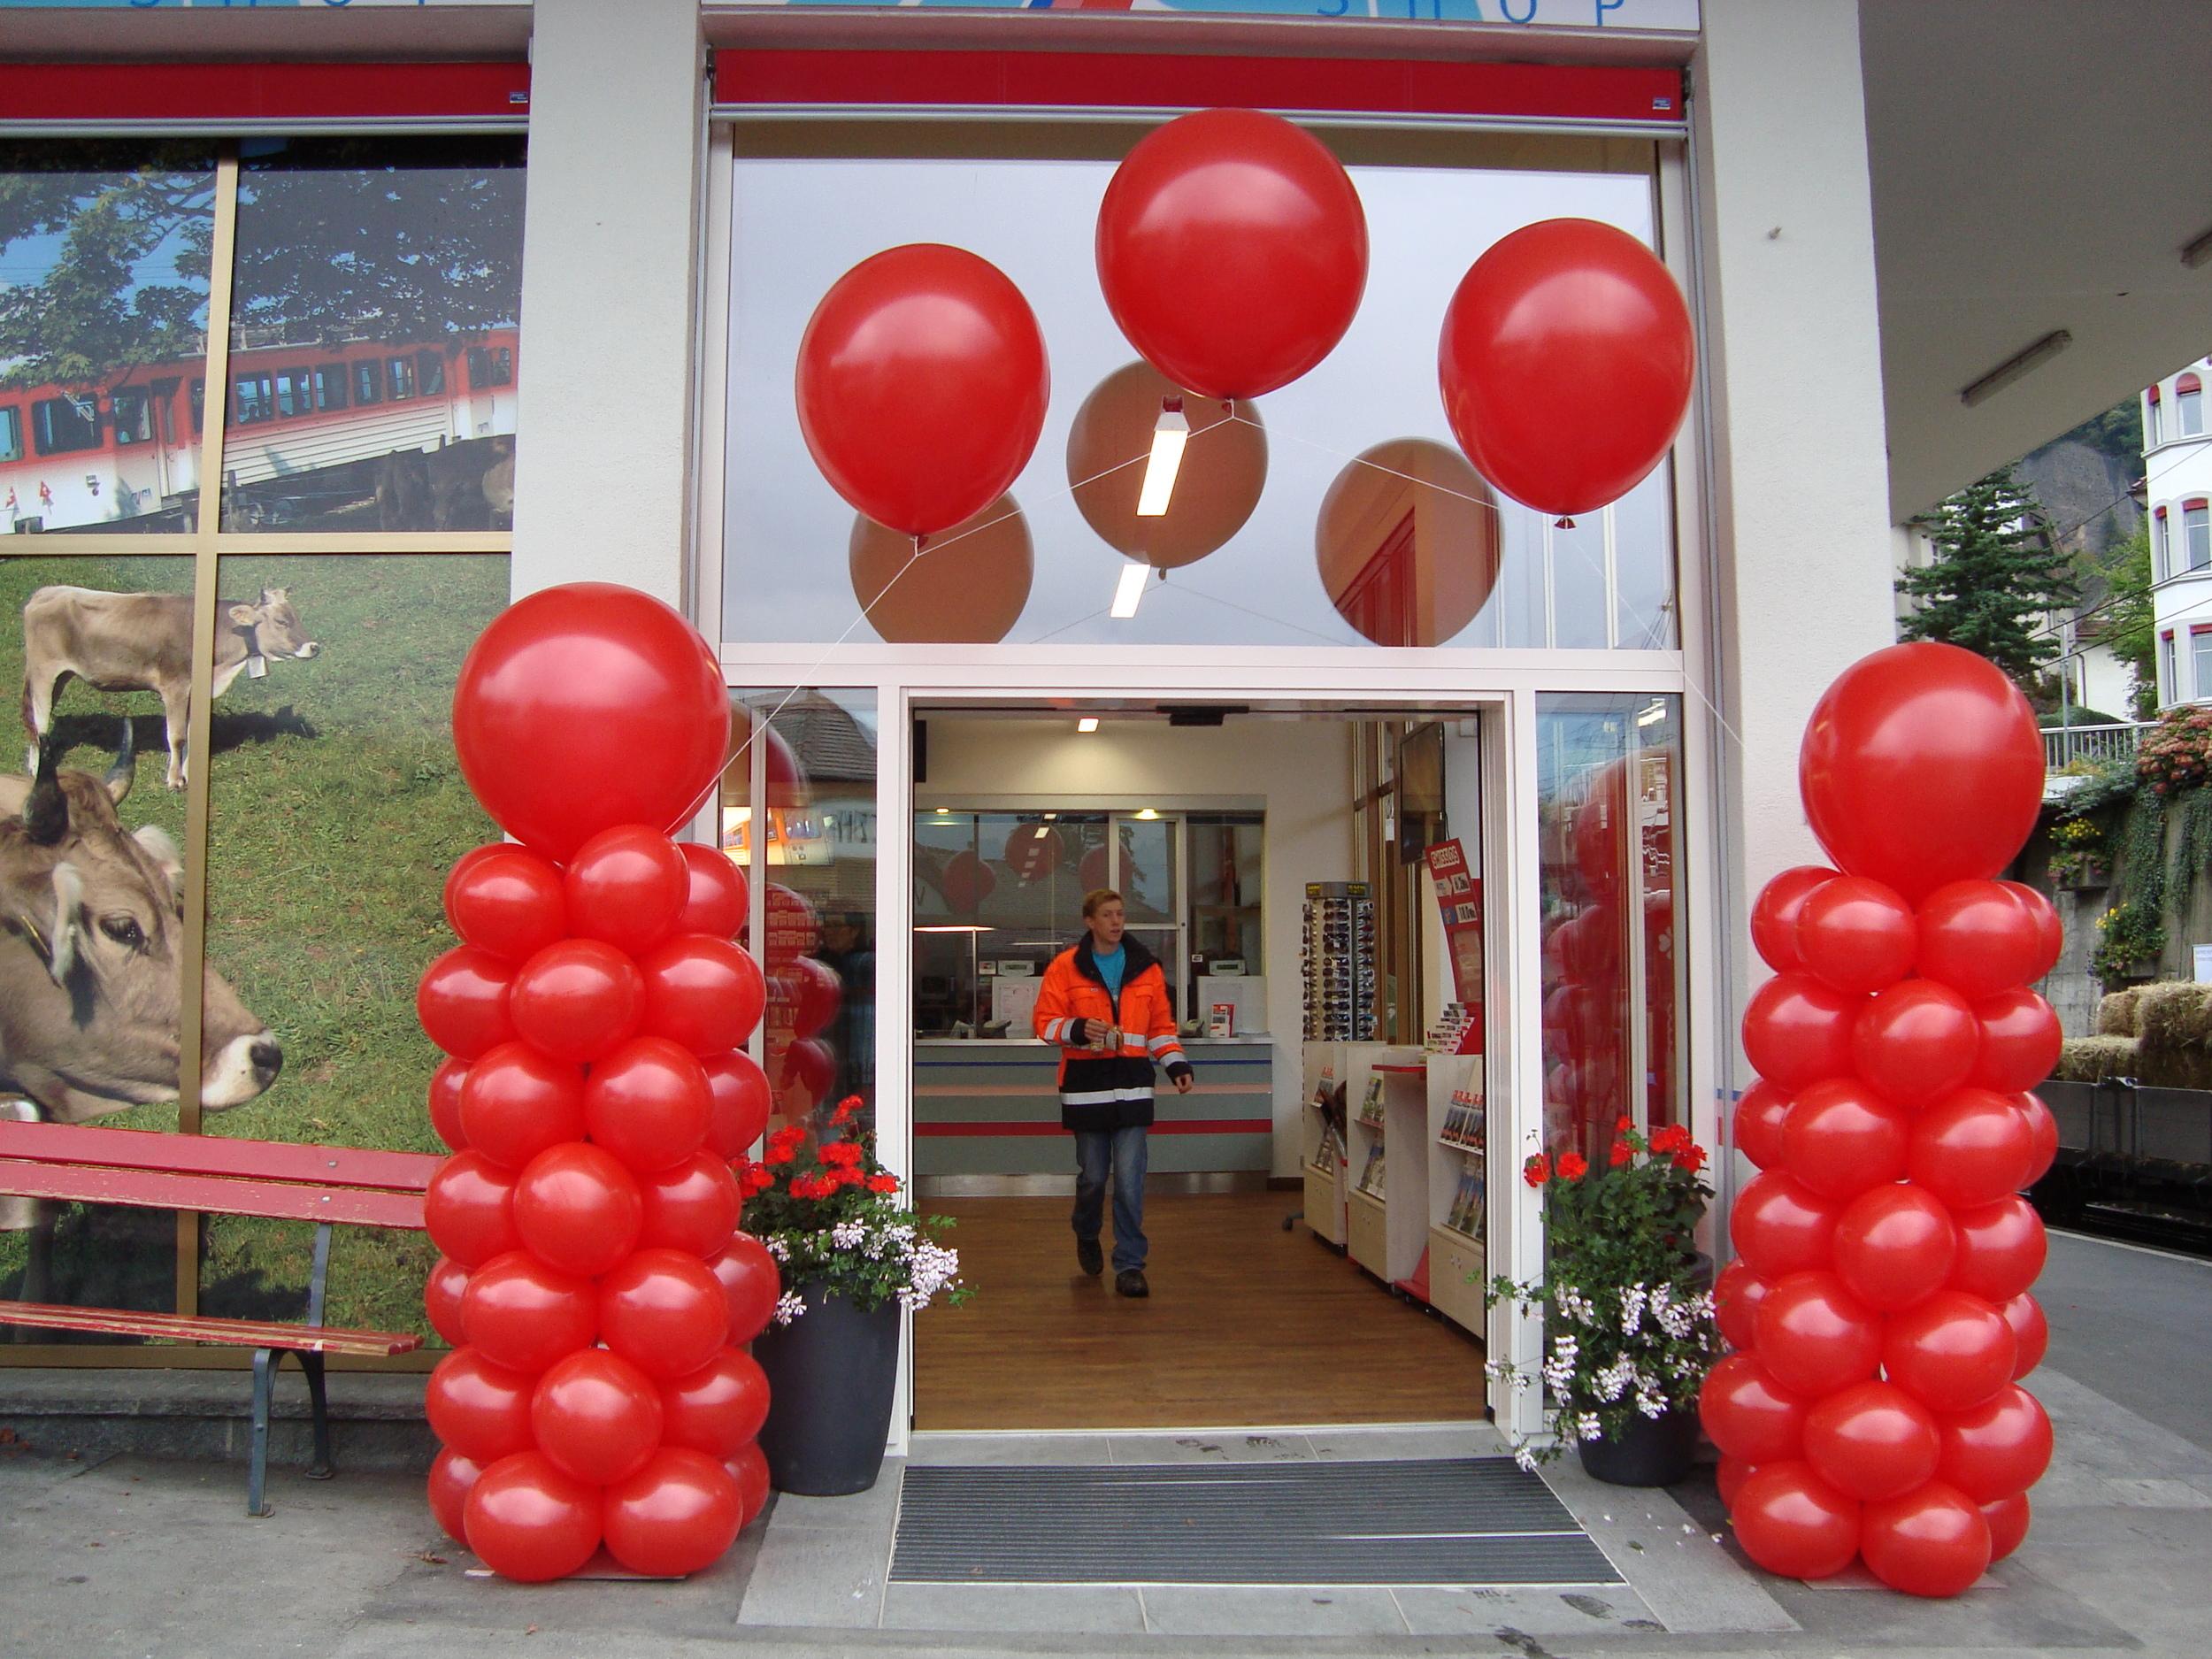 Ballonsäule rot mit Perlbogen.JPG